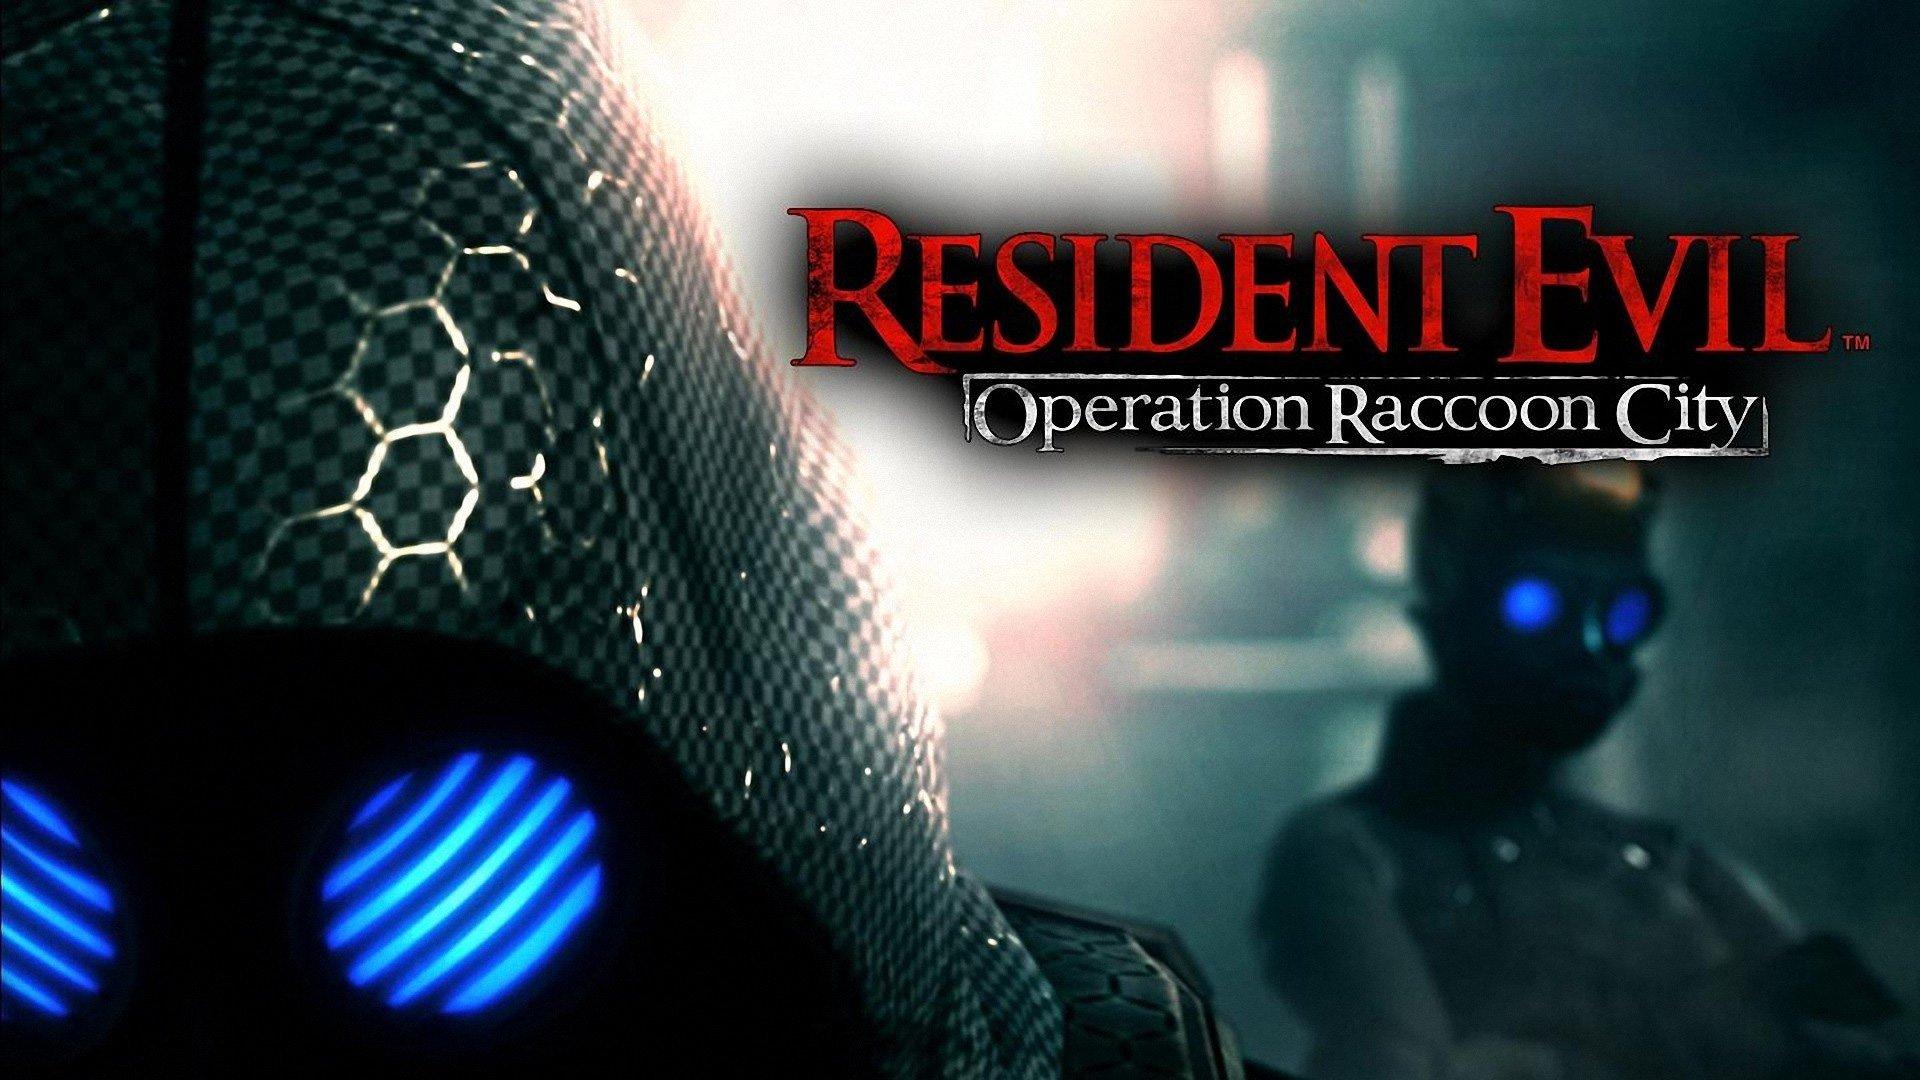 Resident Evil Operation Raccoon City Fond Décran Hd Arrière Plan